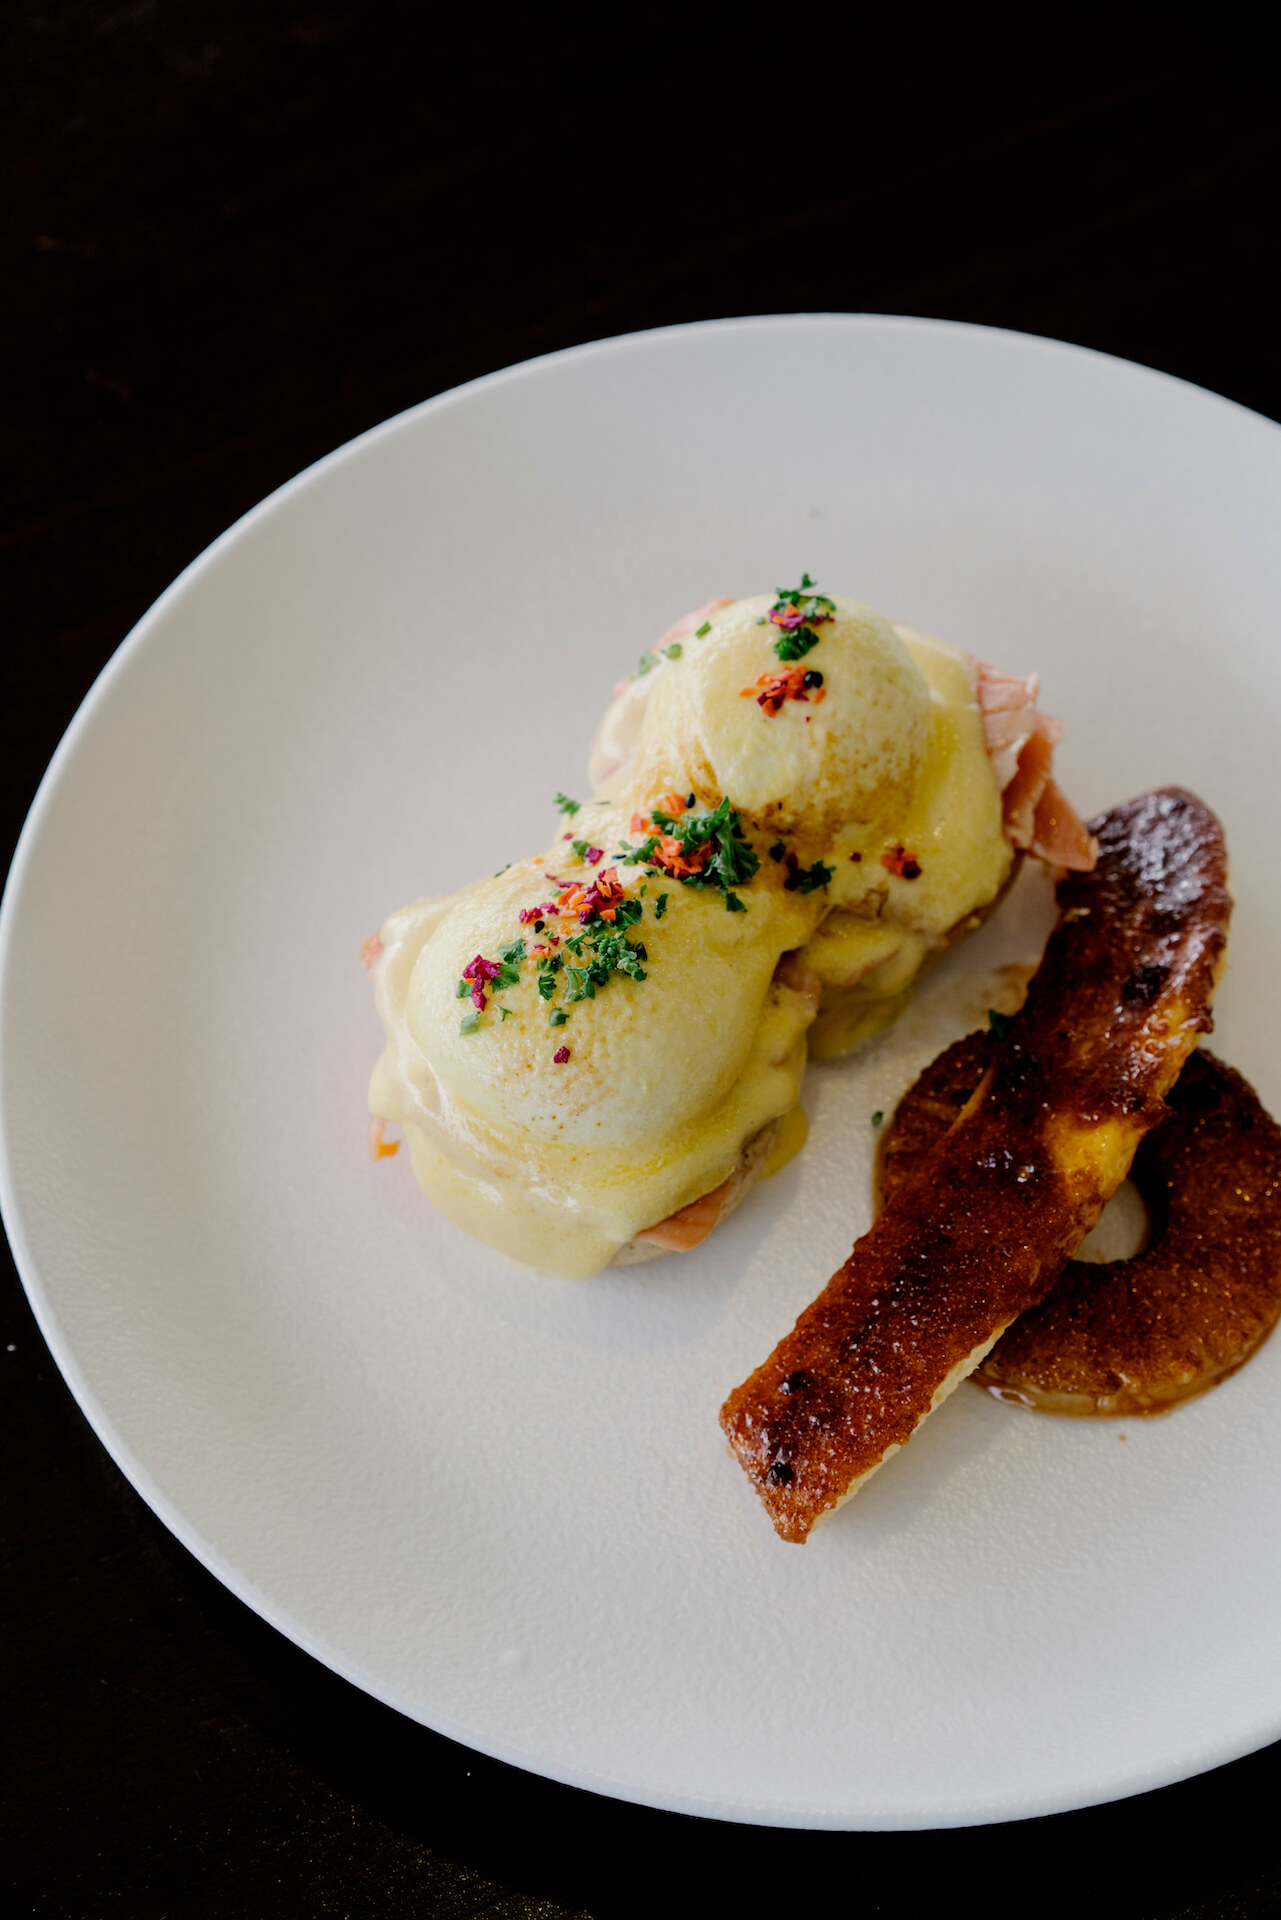 Eggs benedict from Breakfast at Antonio's